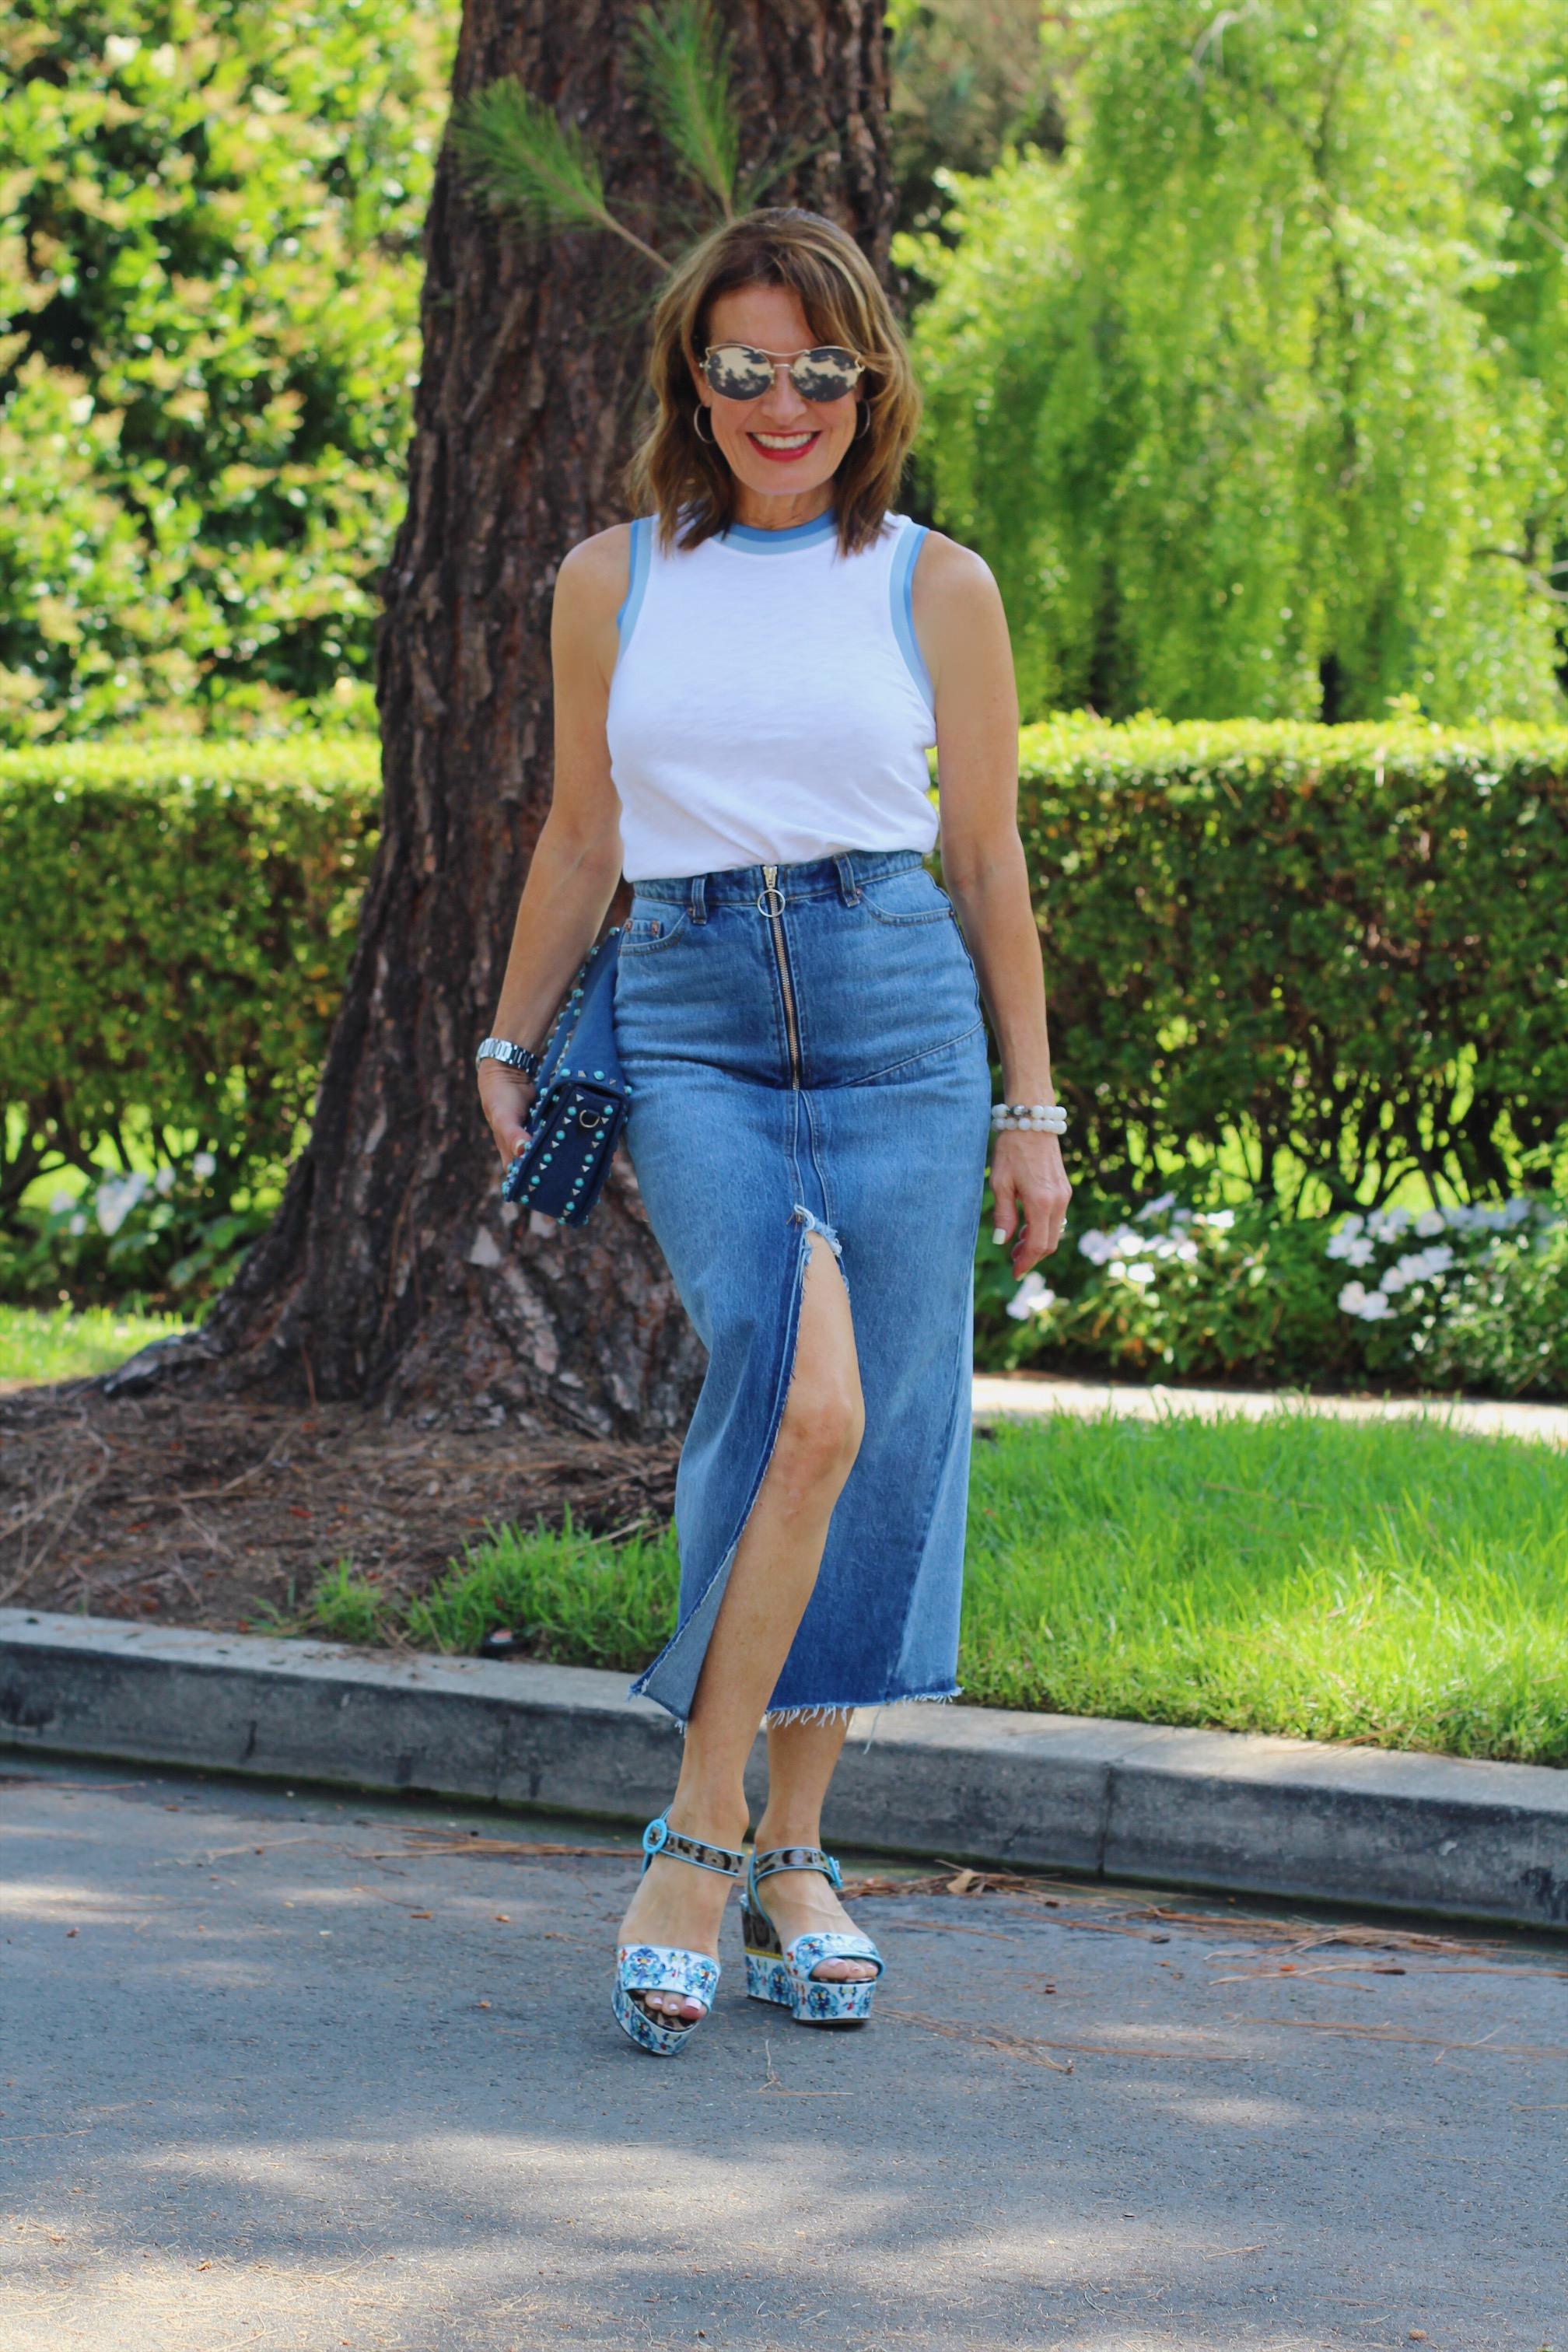 The Kooples denim skirt   ,    Rag and Bone shirt   ,    Dolce and Gabanna sandals   , Valentino handbag, Miu Miu sunglasses, The Jewelry Bar bracelets.